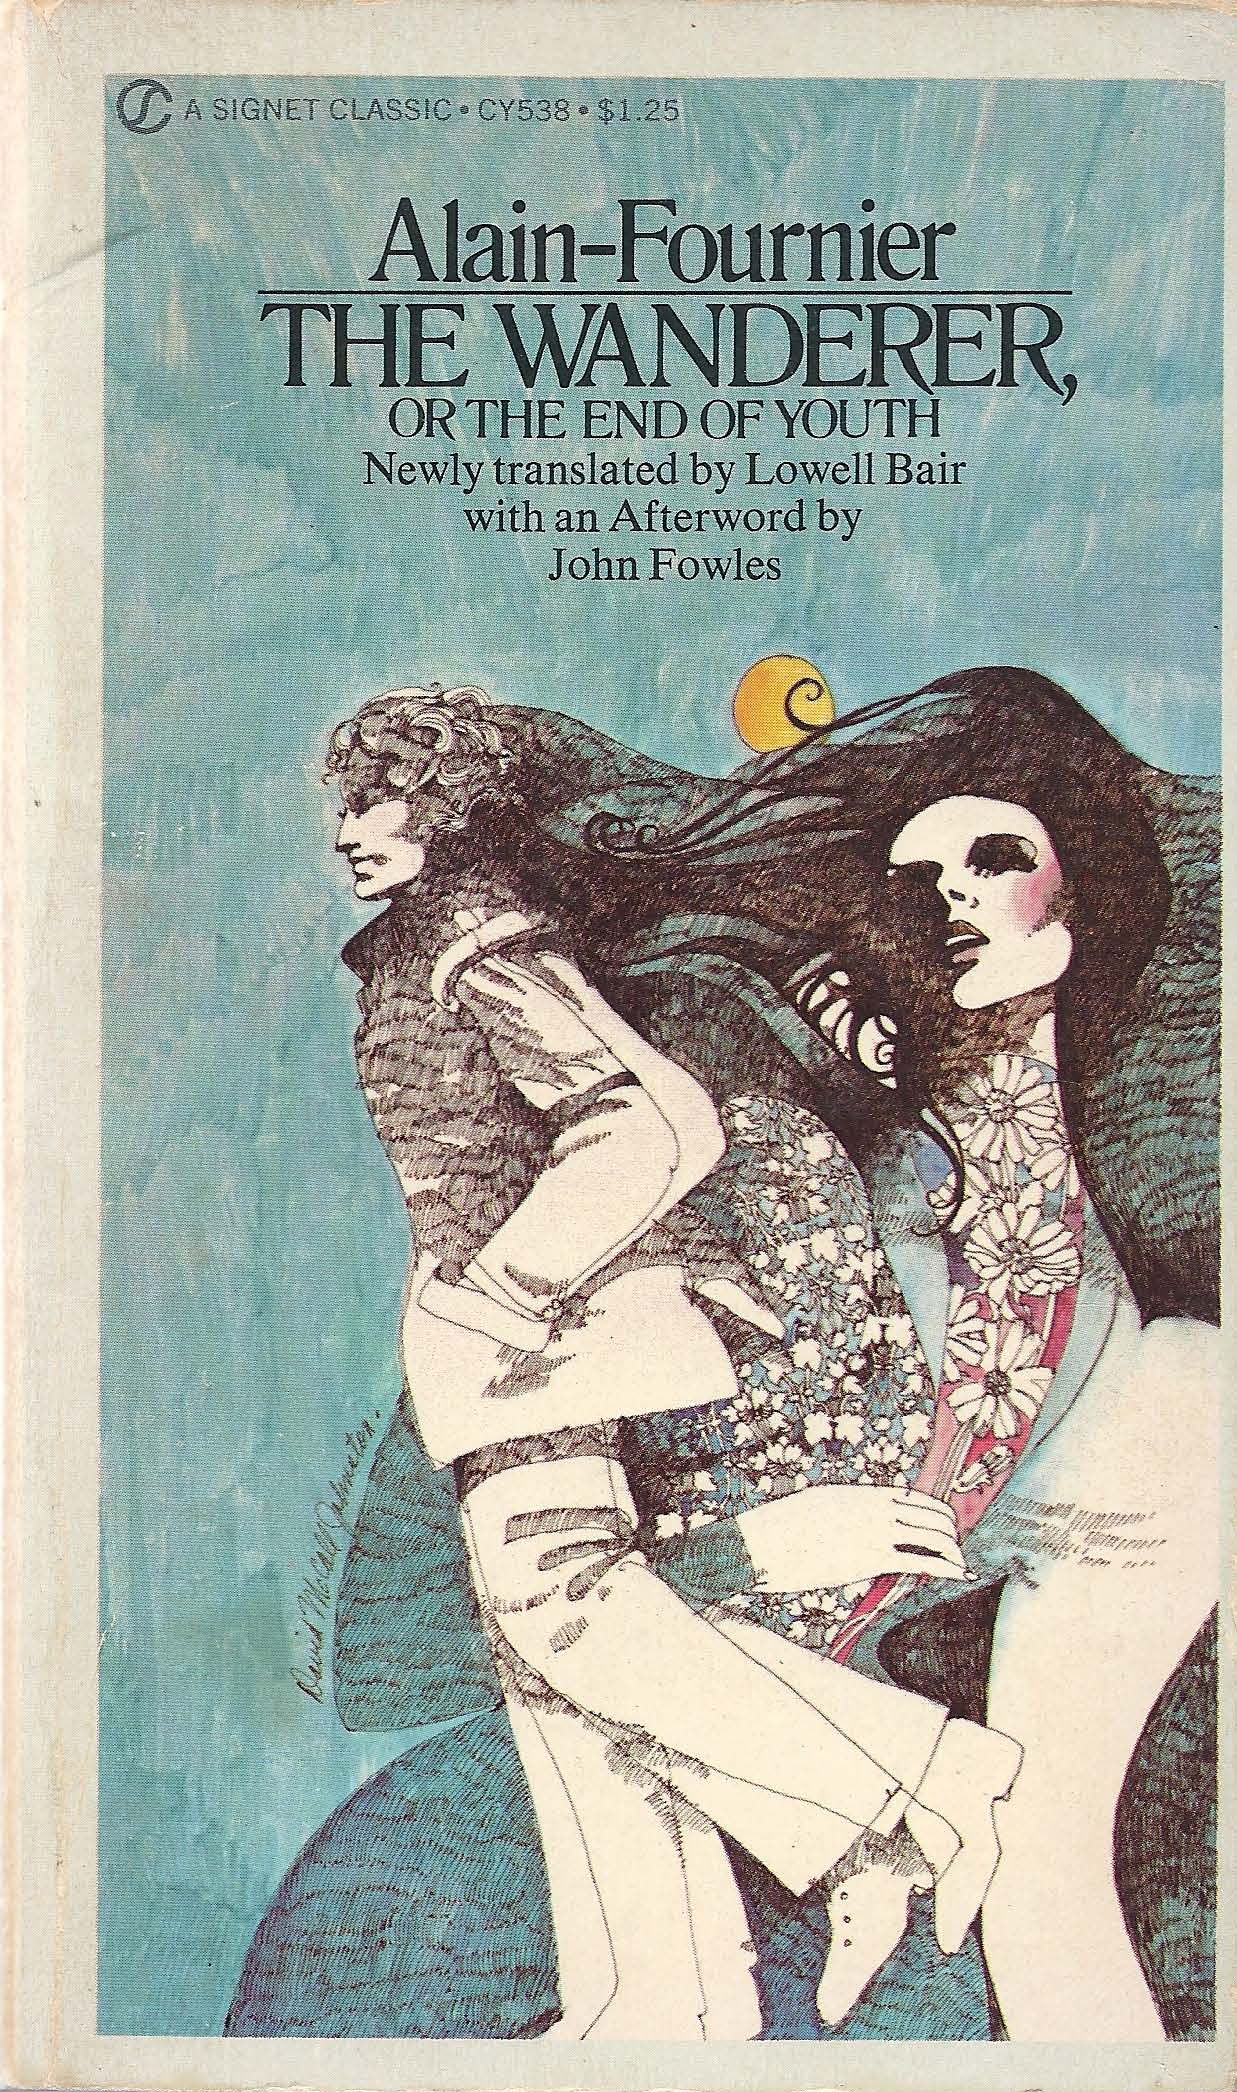 The Wanderer 1970s Signet